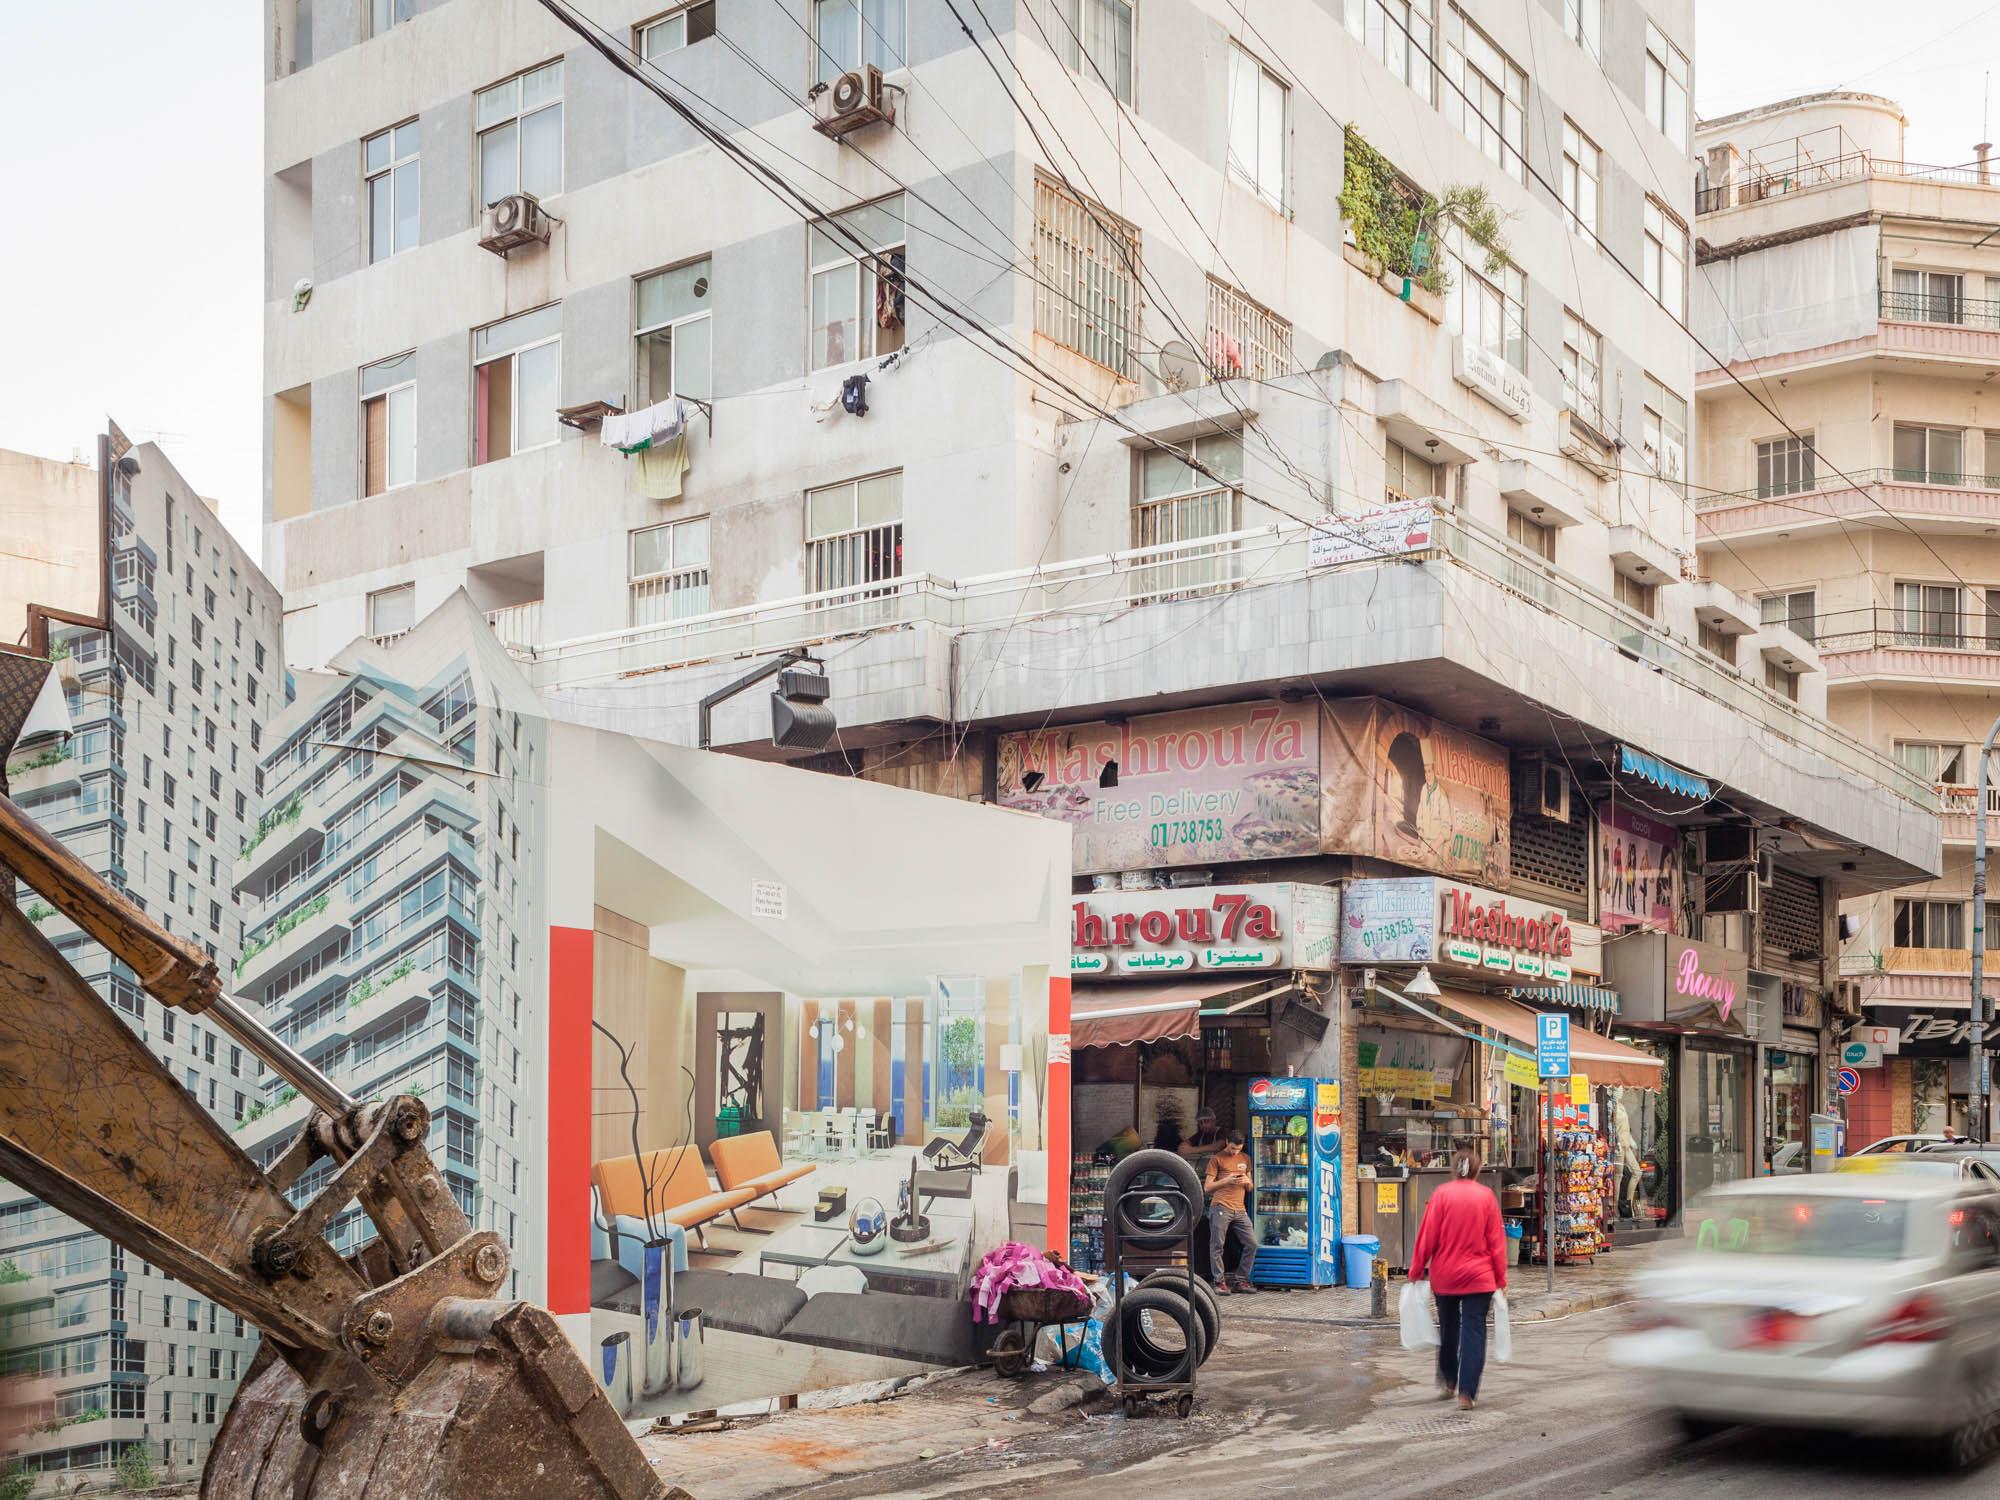 Beirut-9064.jpg